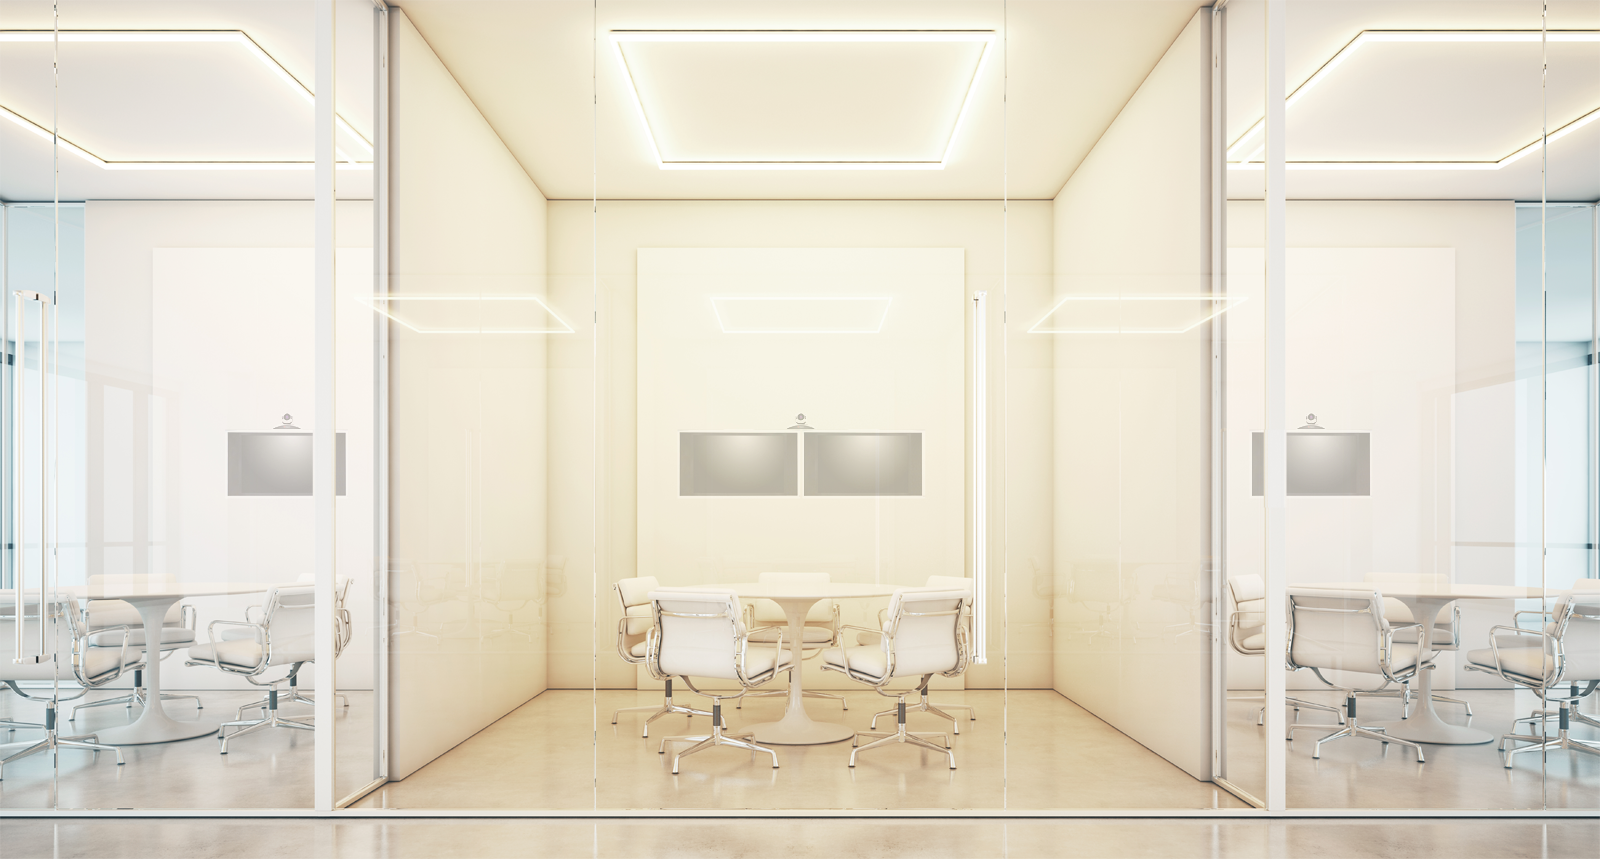 bigstock-Contemporary-Office-Interior-73275004.png